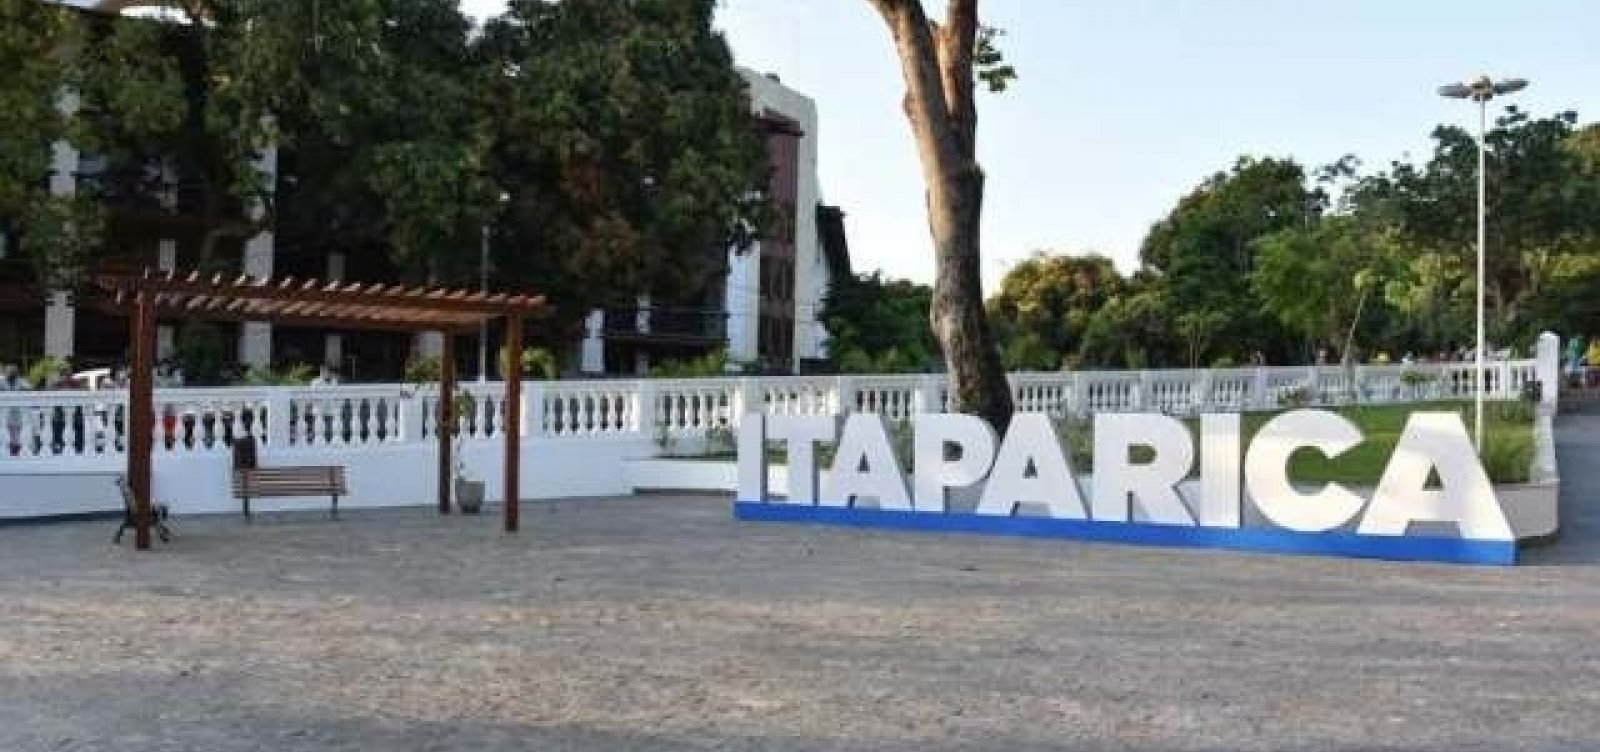 Posto de saúde de Itaparica pode perder vacinas contra Covid após disjuntor ser desligado